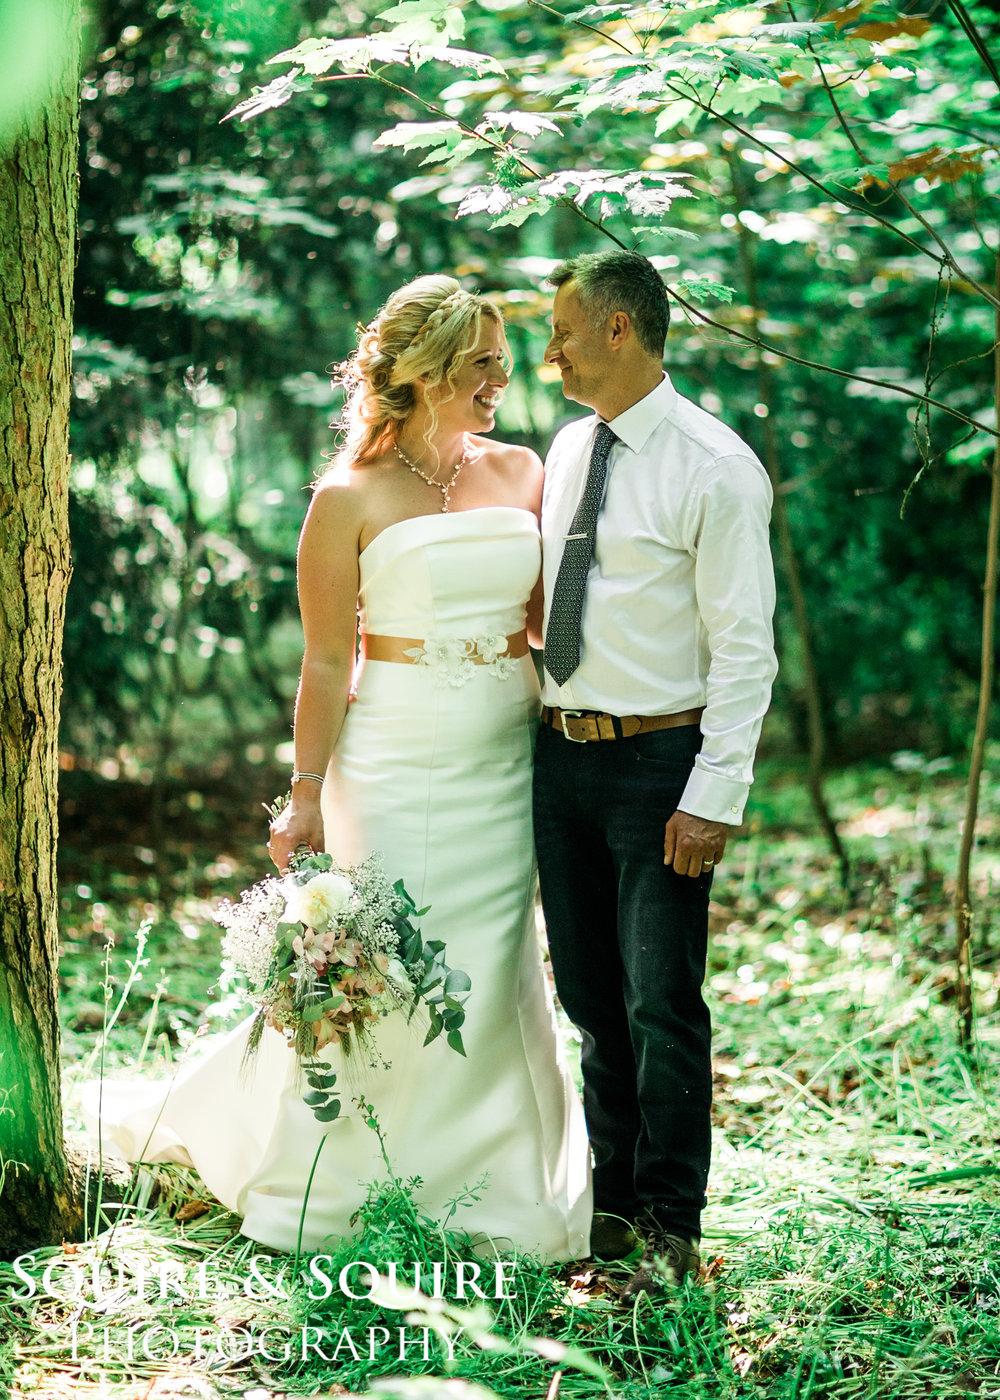 wedding_photography_catthorpe Manor (63 of 66).jpg